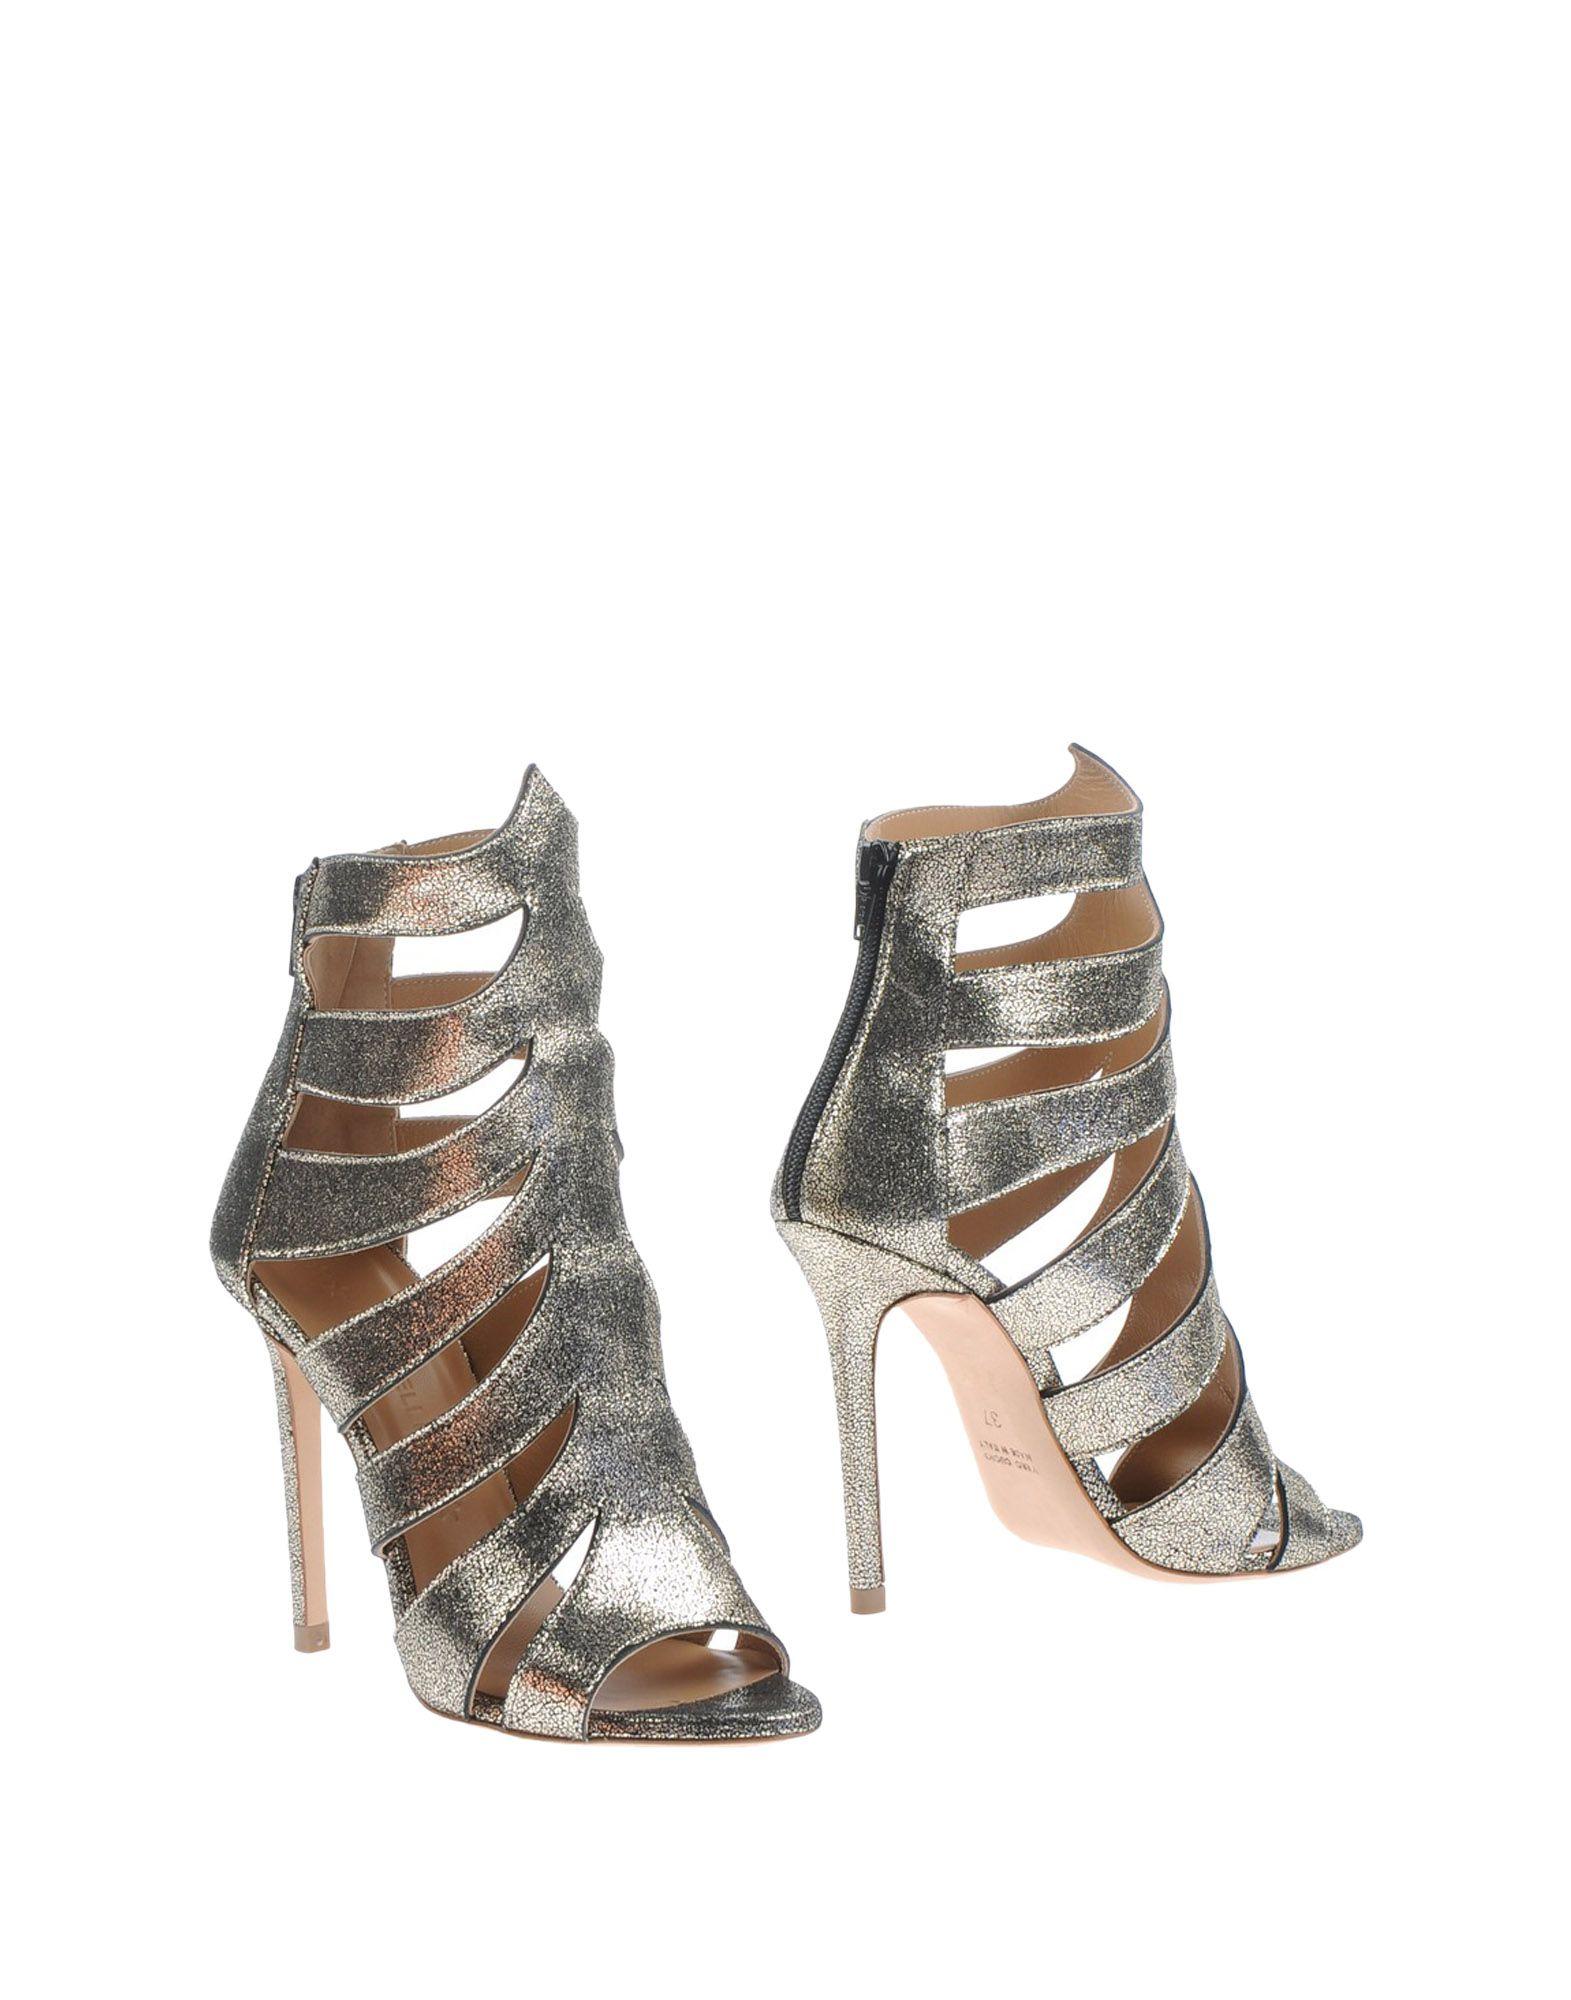 Marc Marc Marc Ellis Sandalen Damen 11334720UG Gute Qualität beliebte Schuhe ec9058